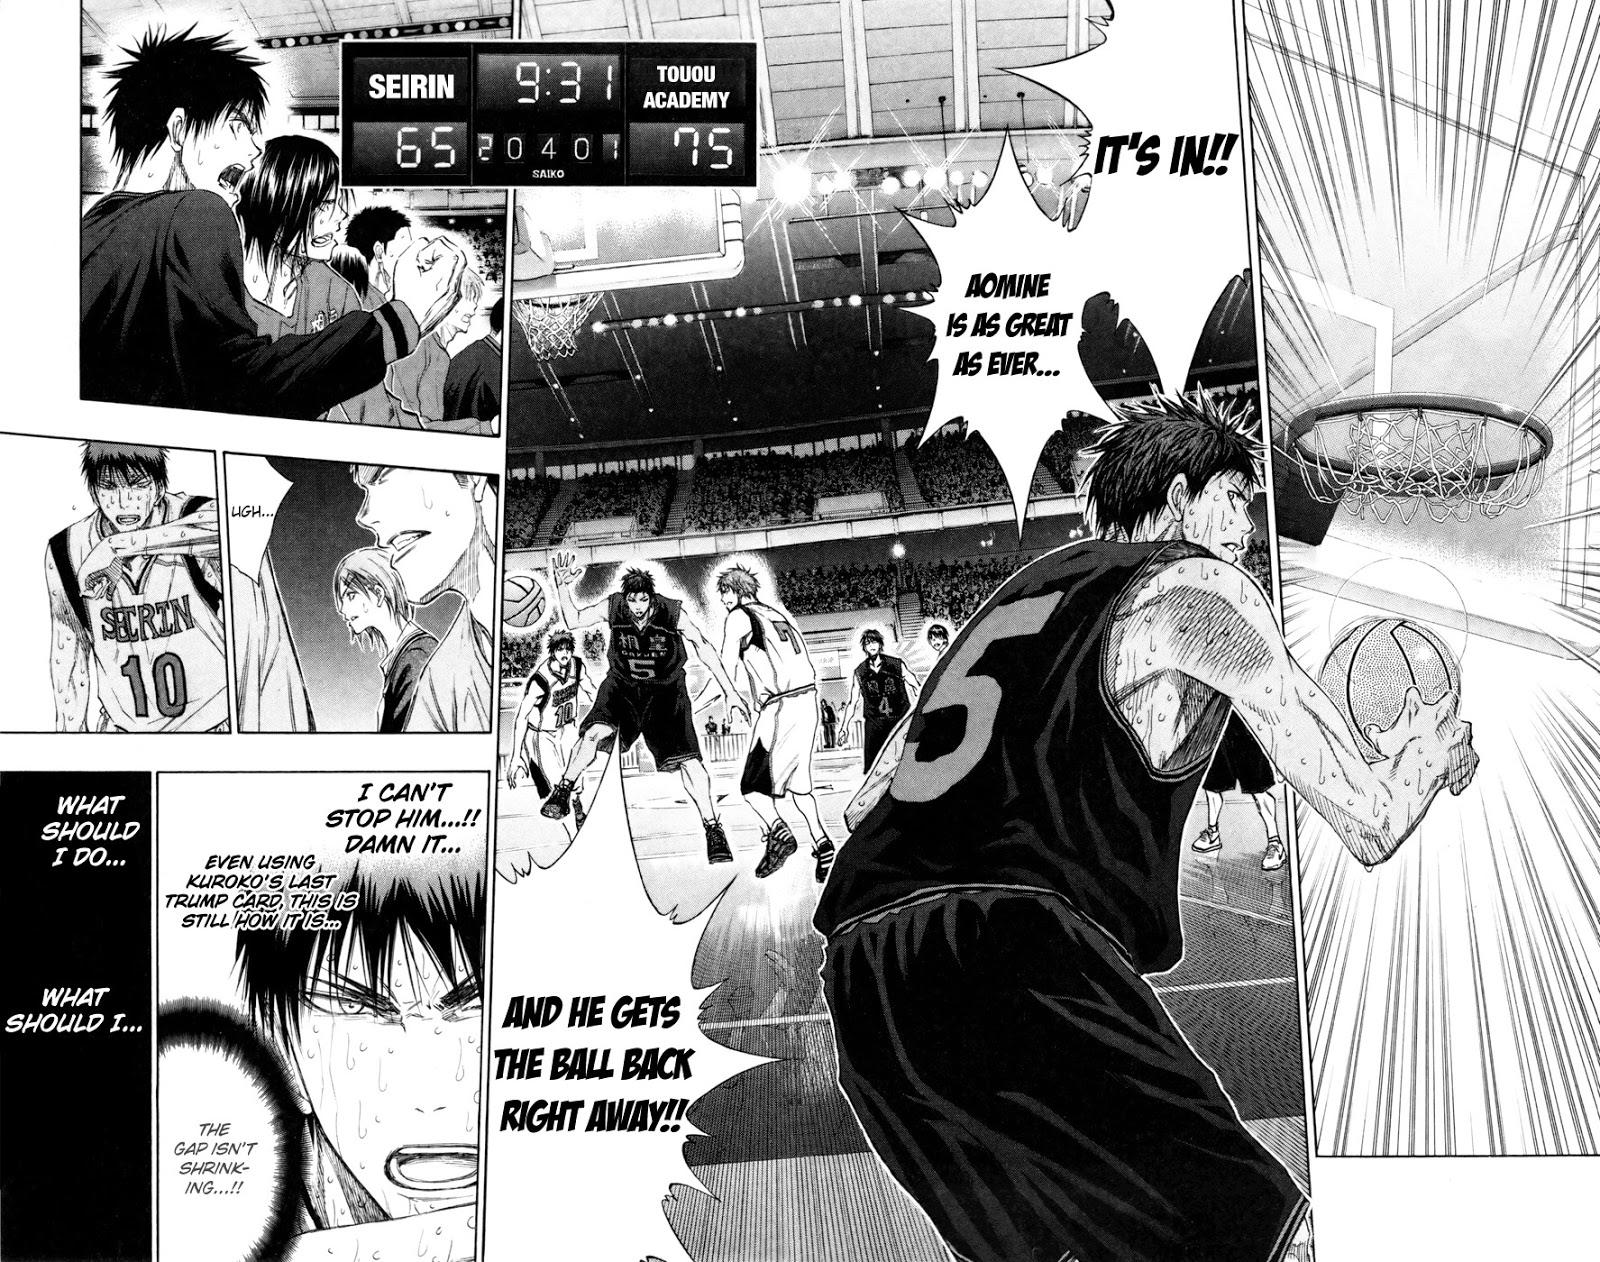 Kuroko no Basket Manga Chapter 131 - Image 02-02